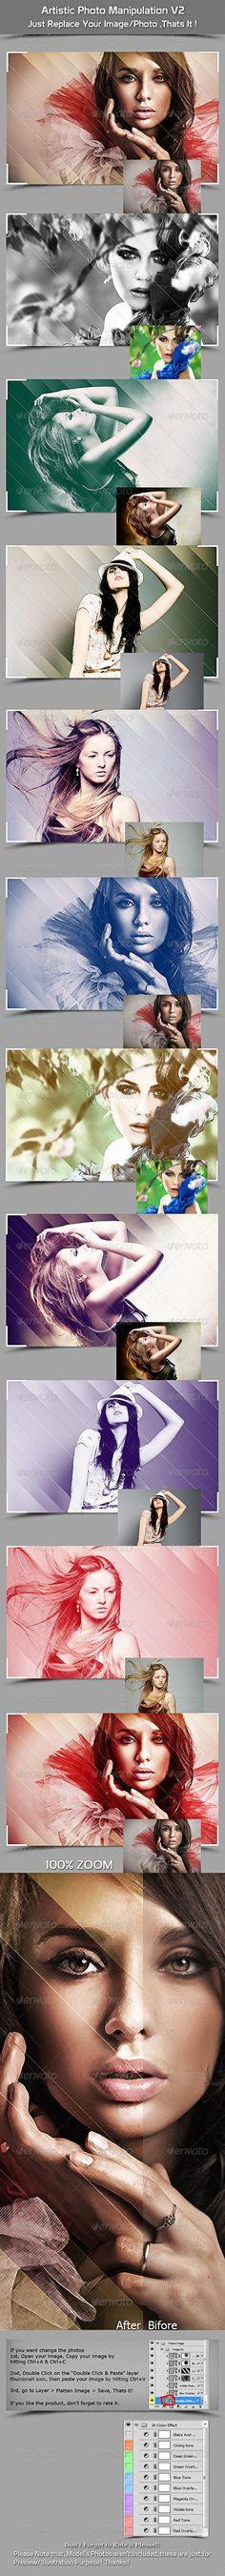 Artistic Photo Manipulation V2